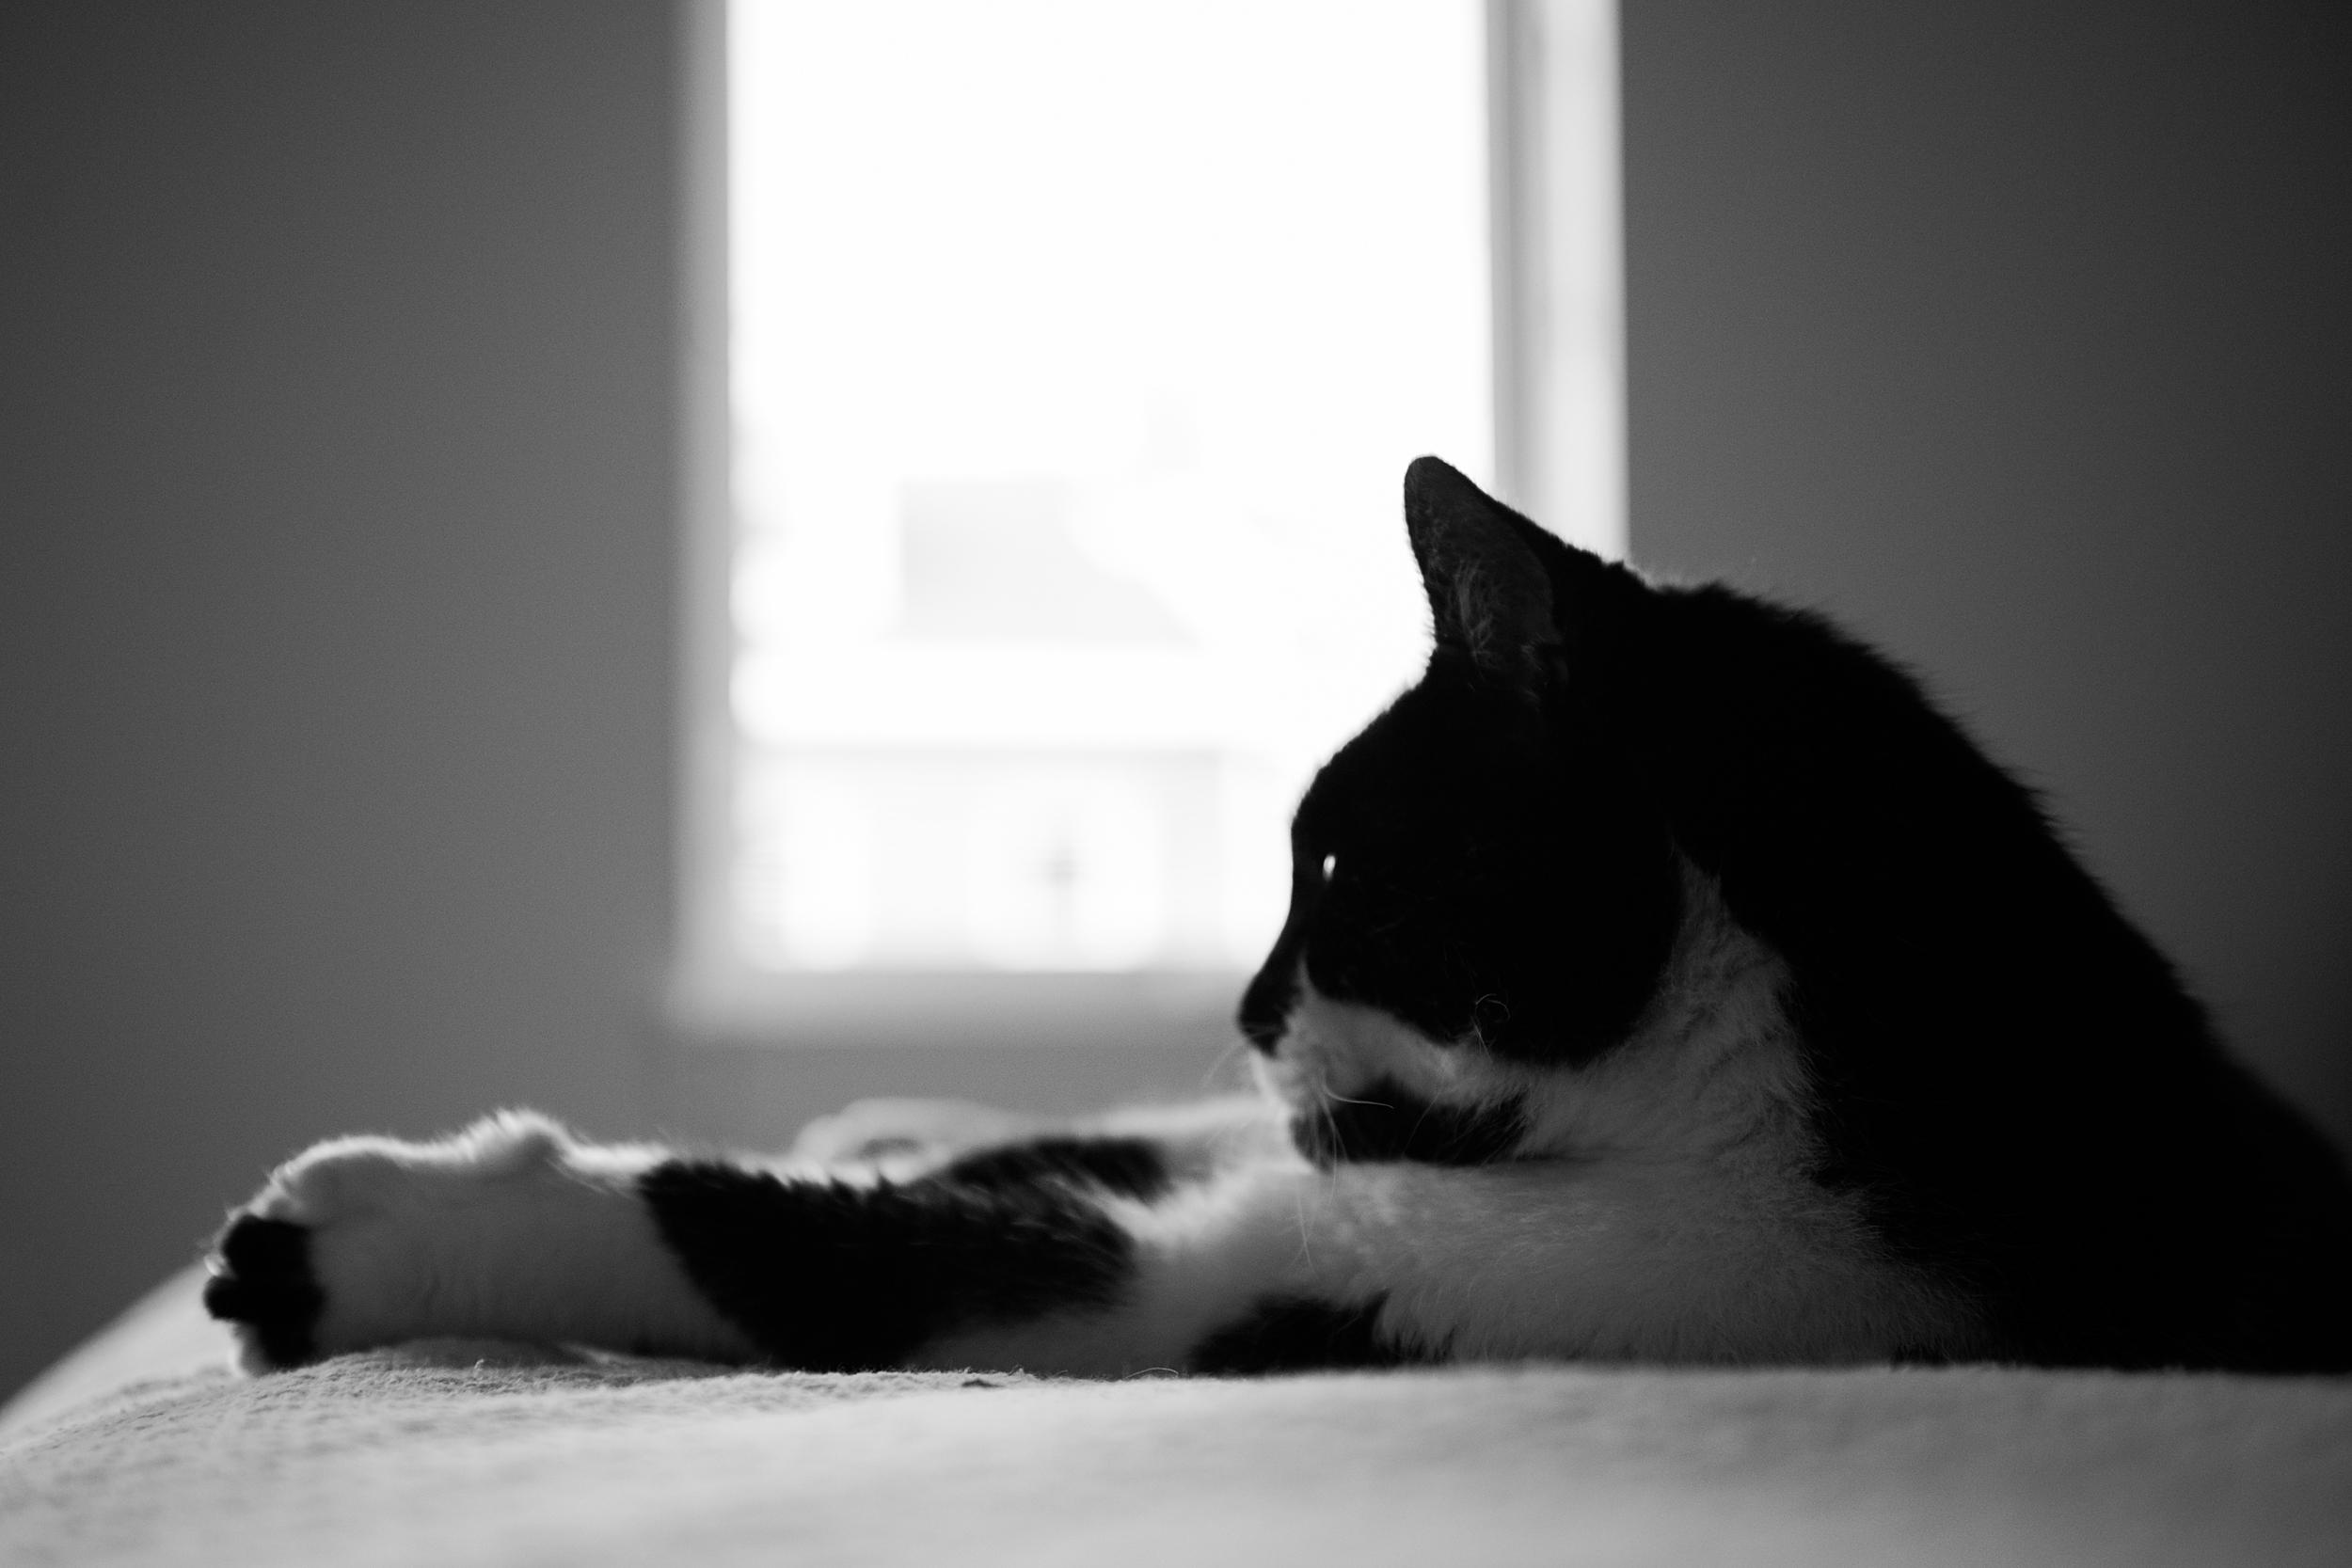 cat-photography-pittsburgh-raymond-07.jpg